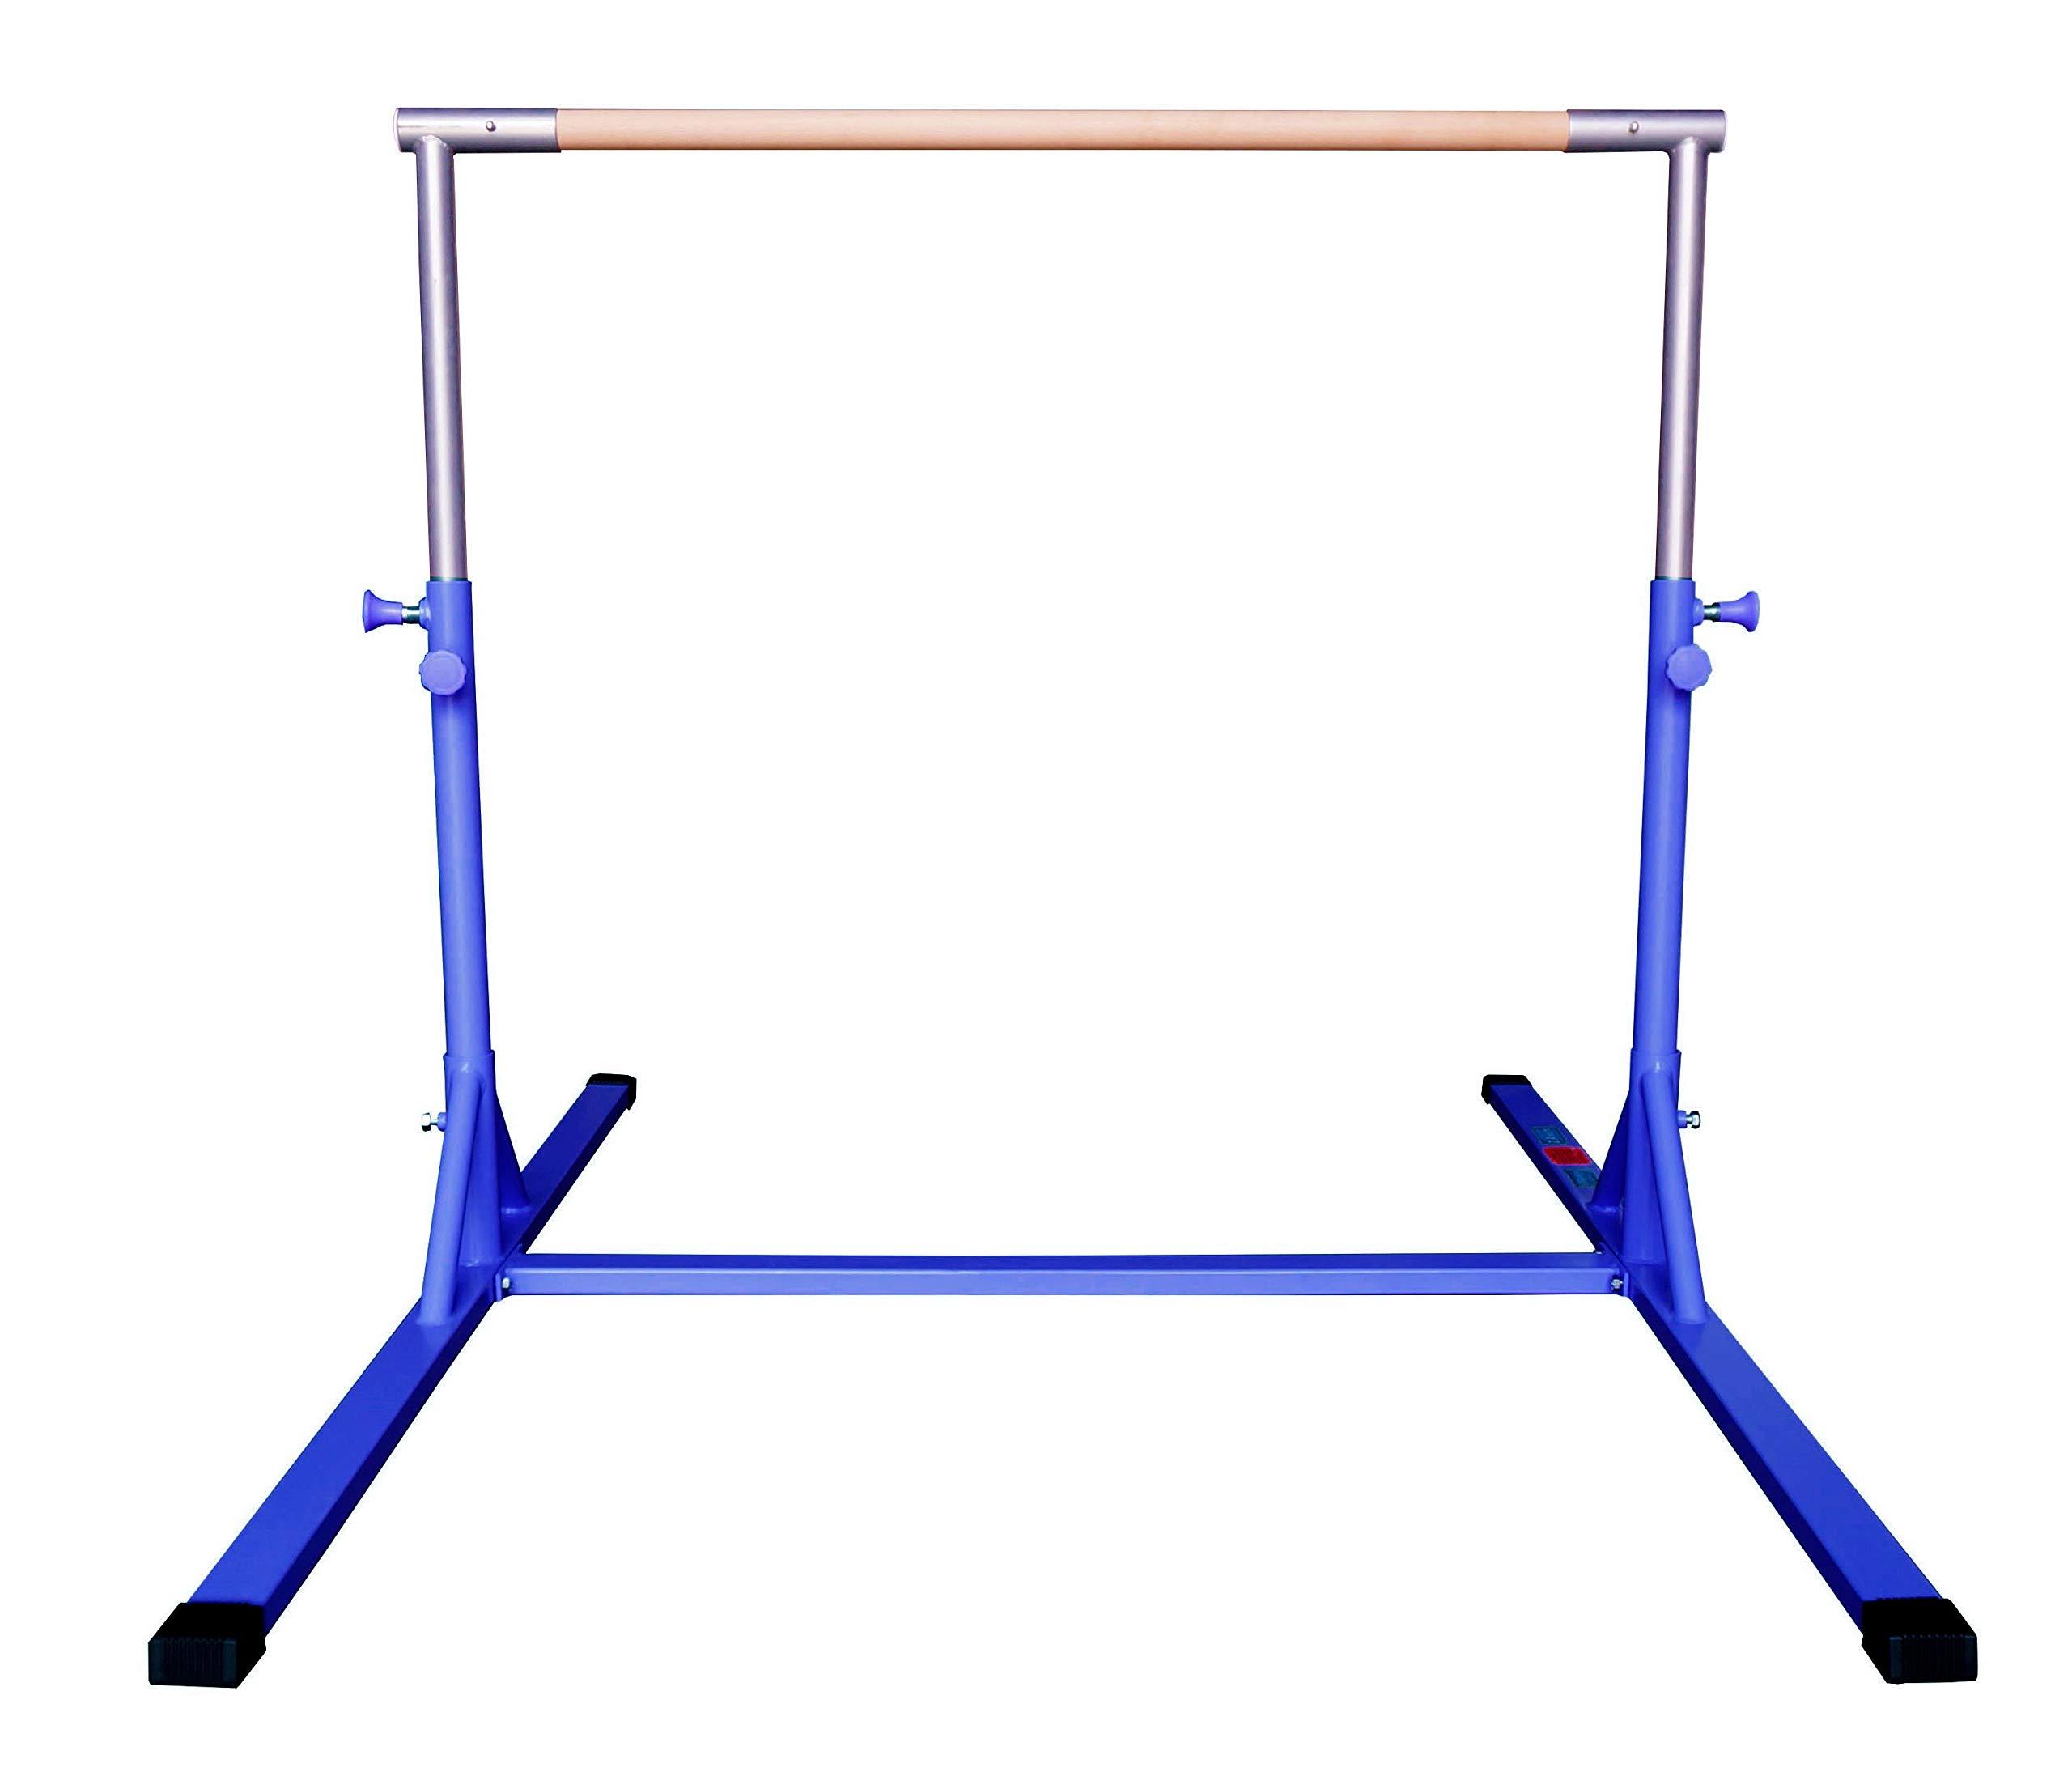 Amazon.com : Z ATHLETIC Elite Gymnastics Adjustable Height Training Bar for Kips, (Blue) : Sports & Outdoors